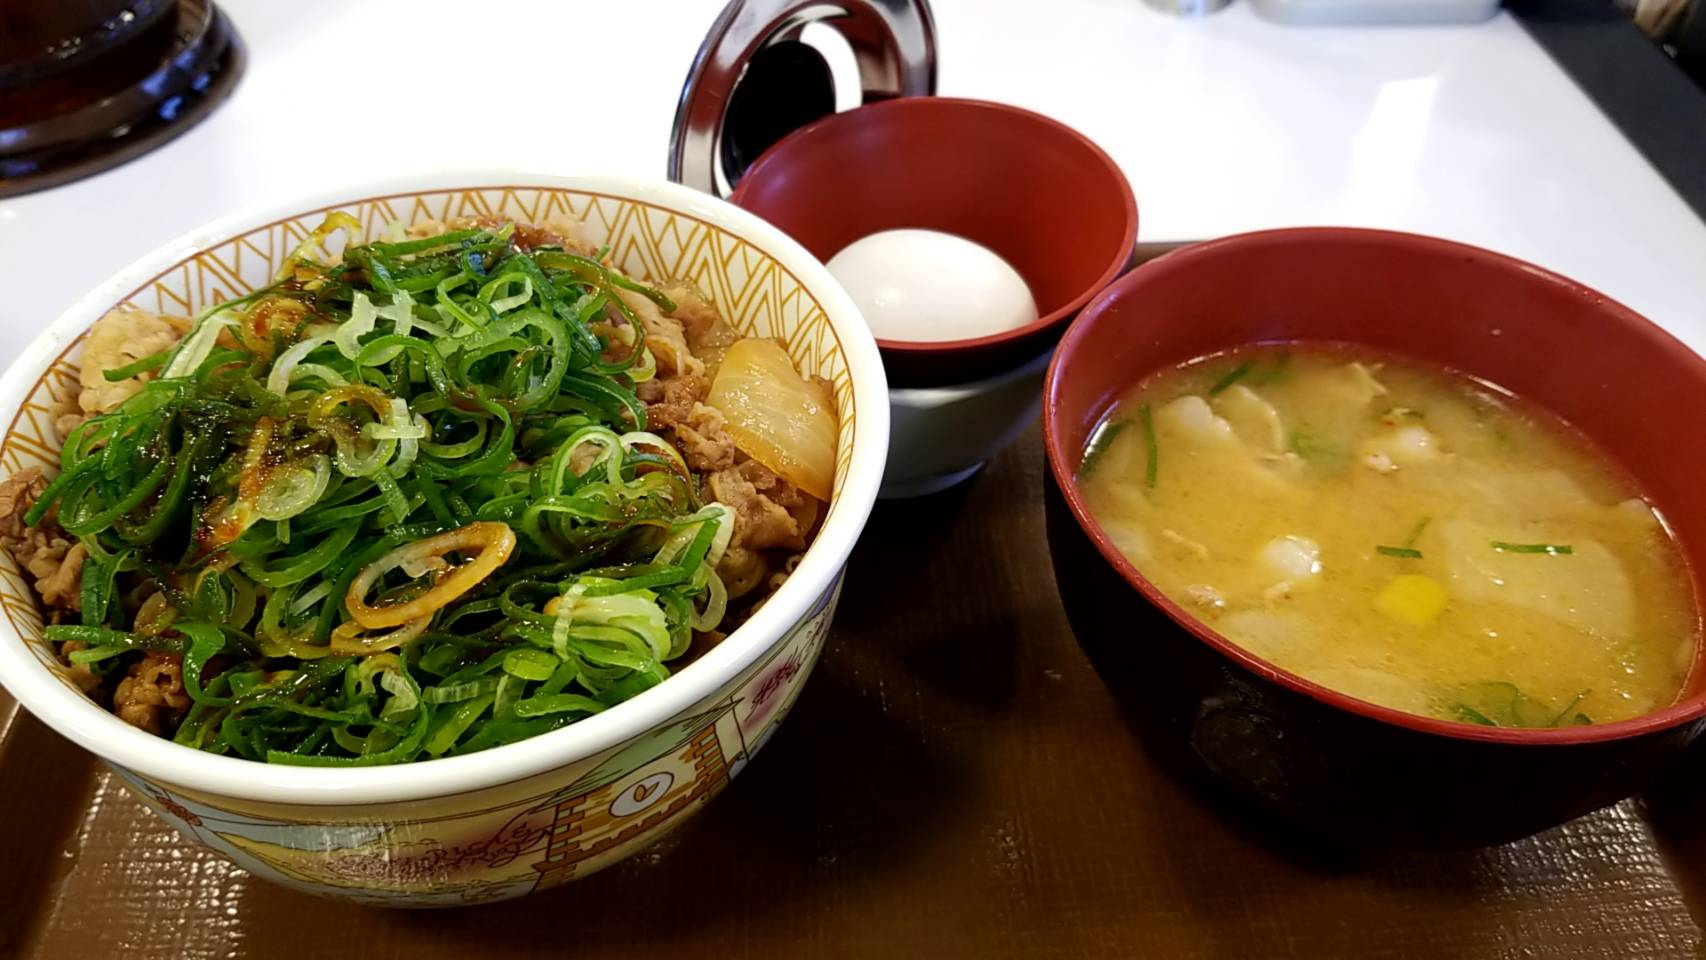 すき家 1国枚方北中振店(枚方市/牛丼)